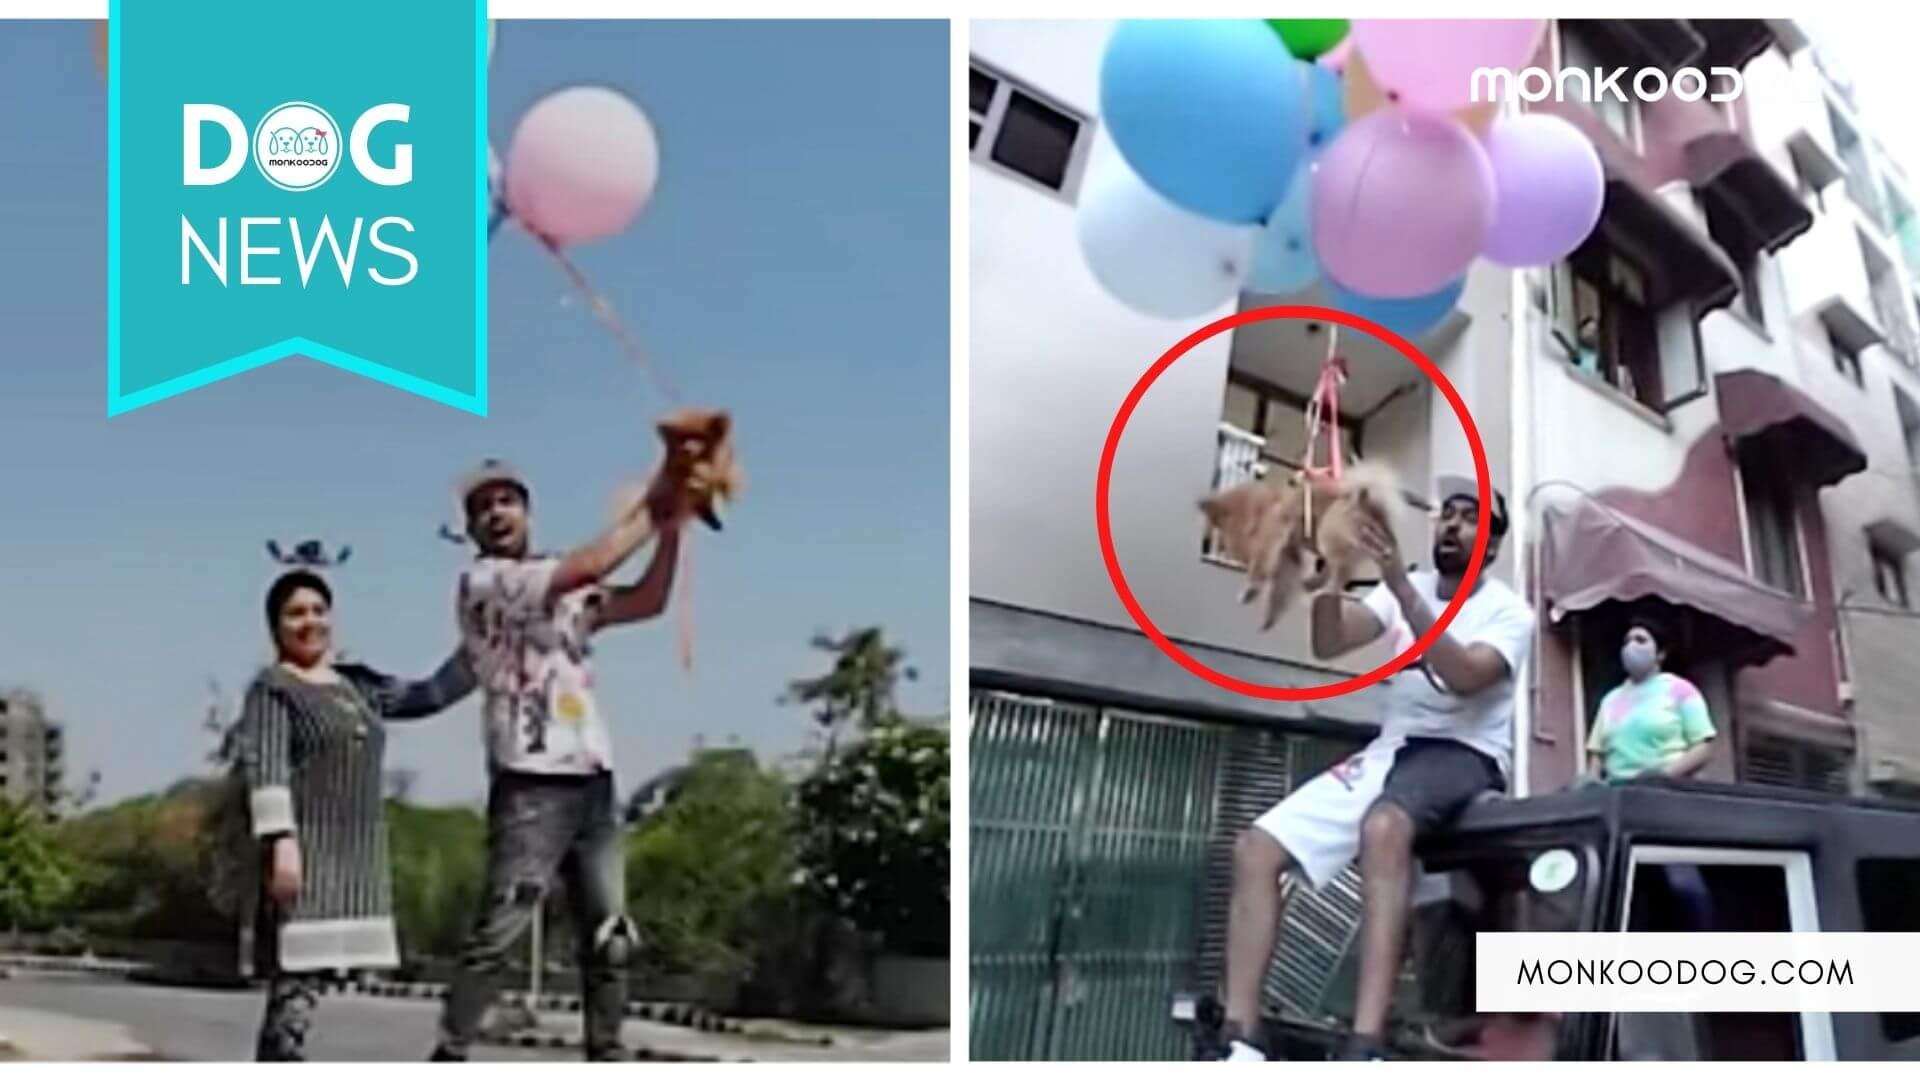 Delhi based Youtuber Gaurav Zone arrested for Flying his Dog with Hydrogen balloons